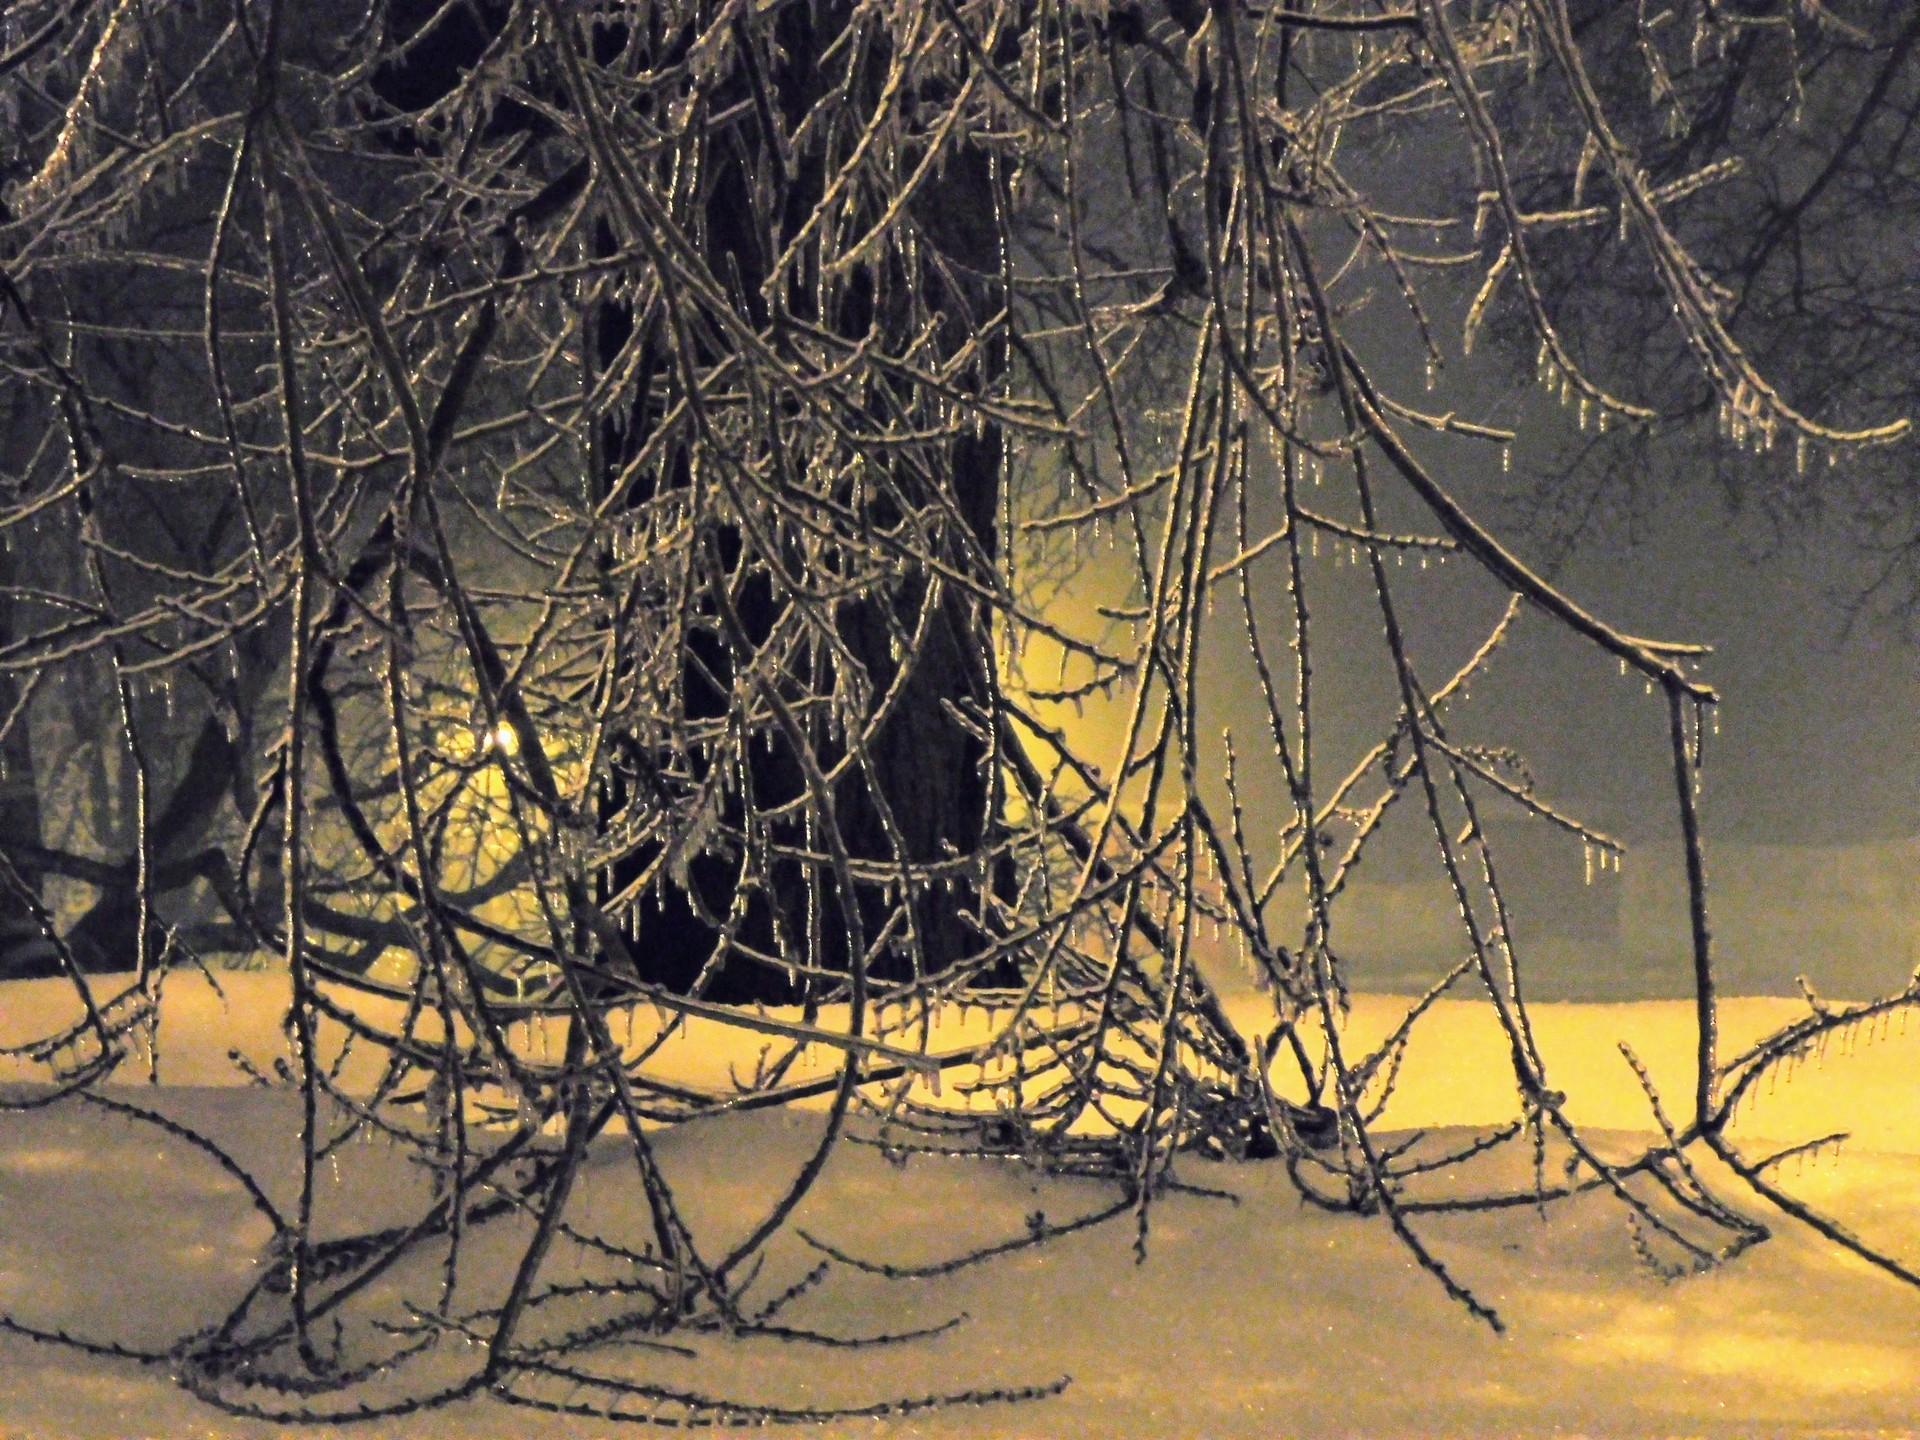 Frozen branches, ice storm | rick.cognyl.fournier, branch, dawn, landscape